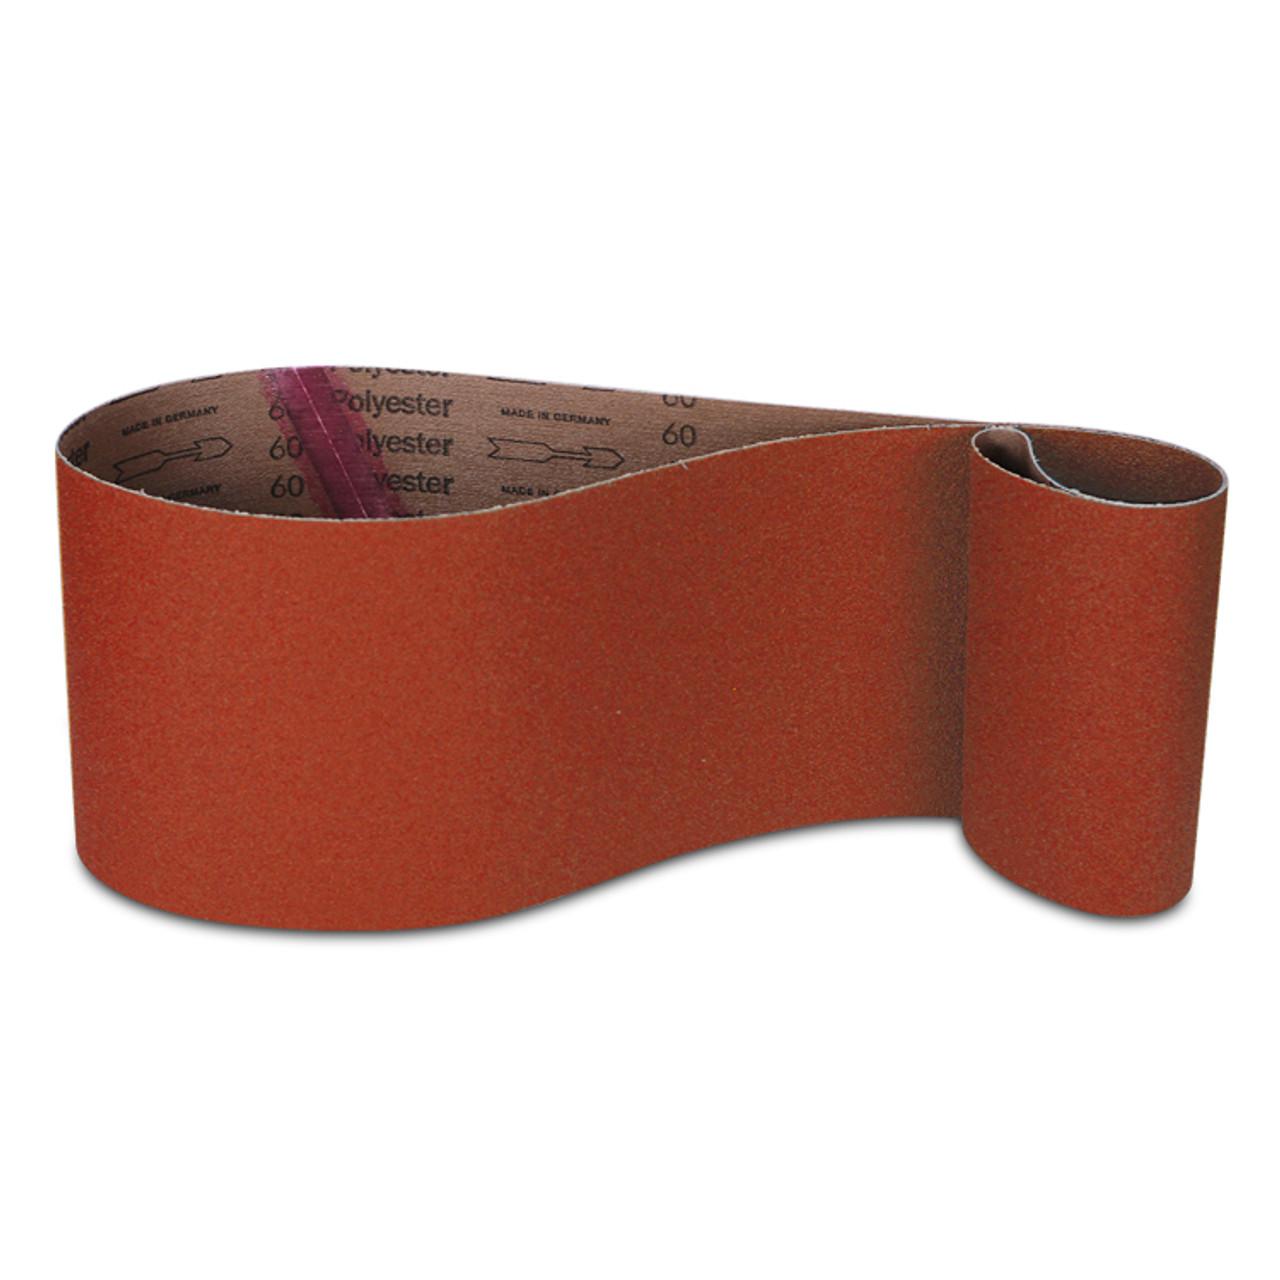 6 X 48 Ceramic Sanding Belt